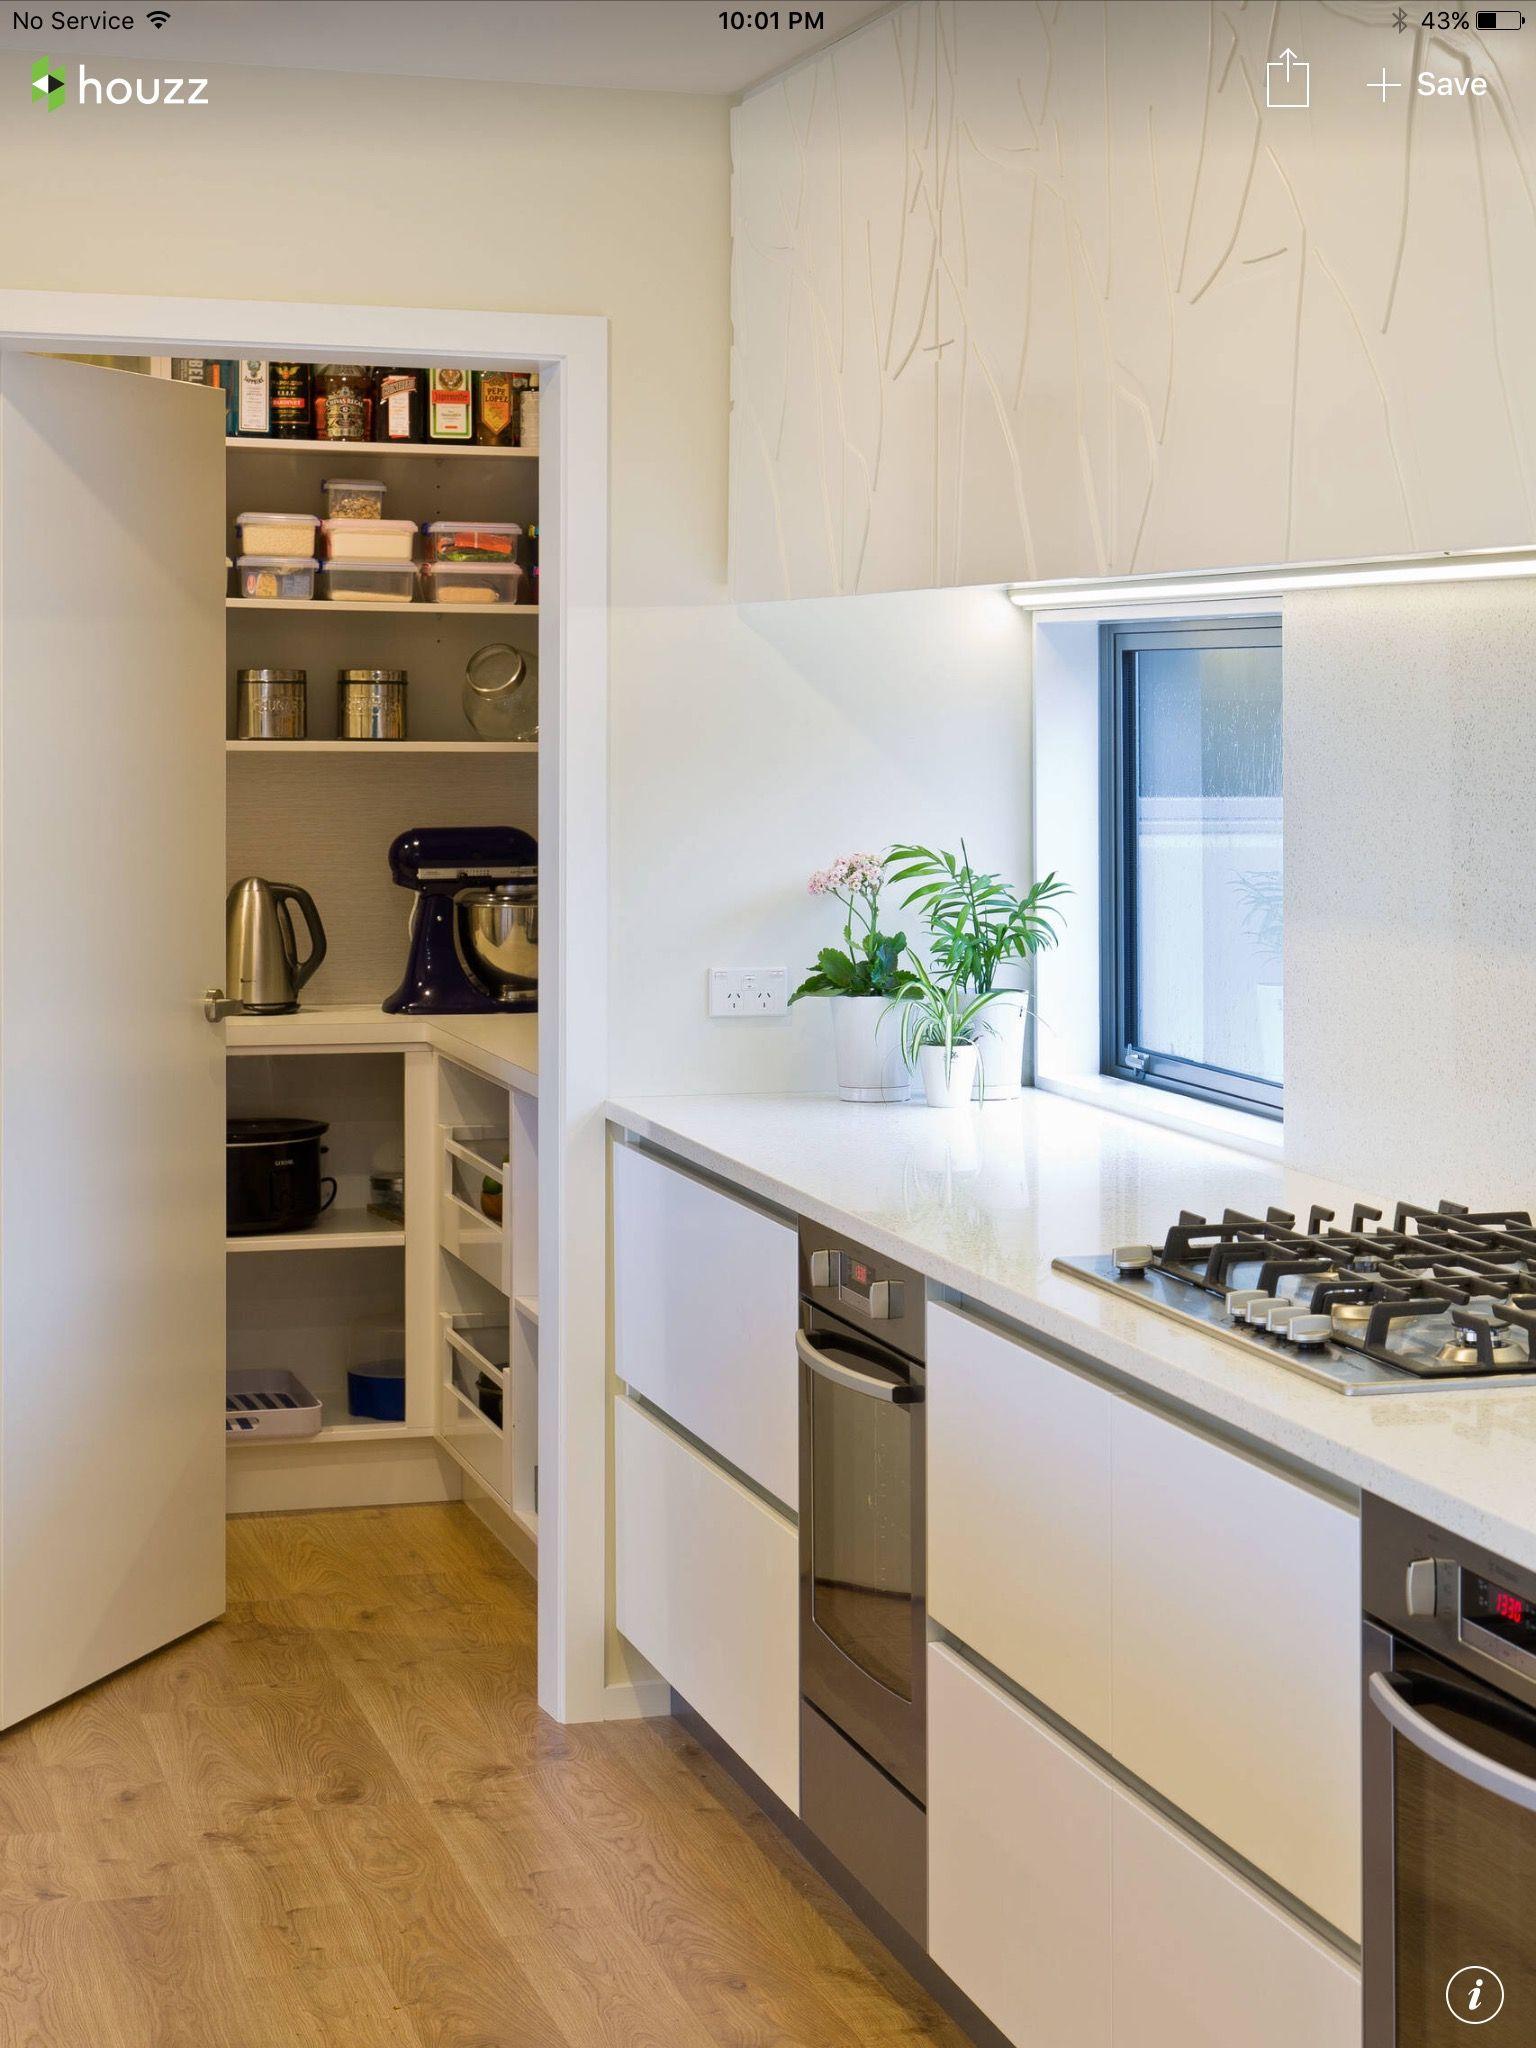 Schön Houzz Kücheninseln Ideen - Küchen Ideen Modern ...